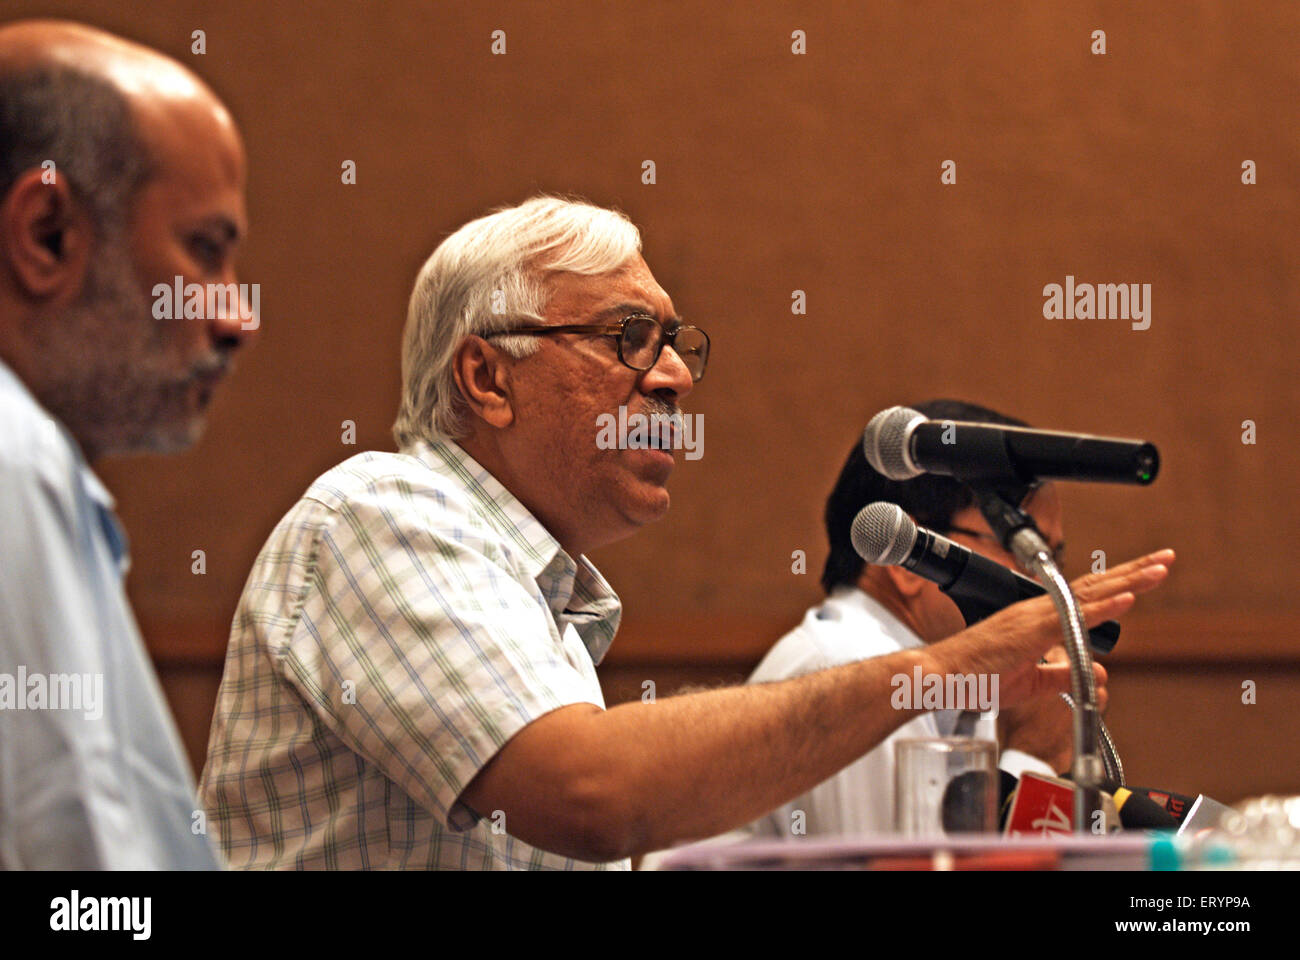 Election Commissioner S.Y. Quraishi ; India NO MR 1 April 2009 - Stock Image